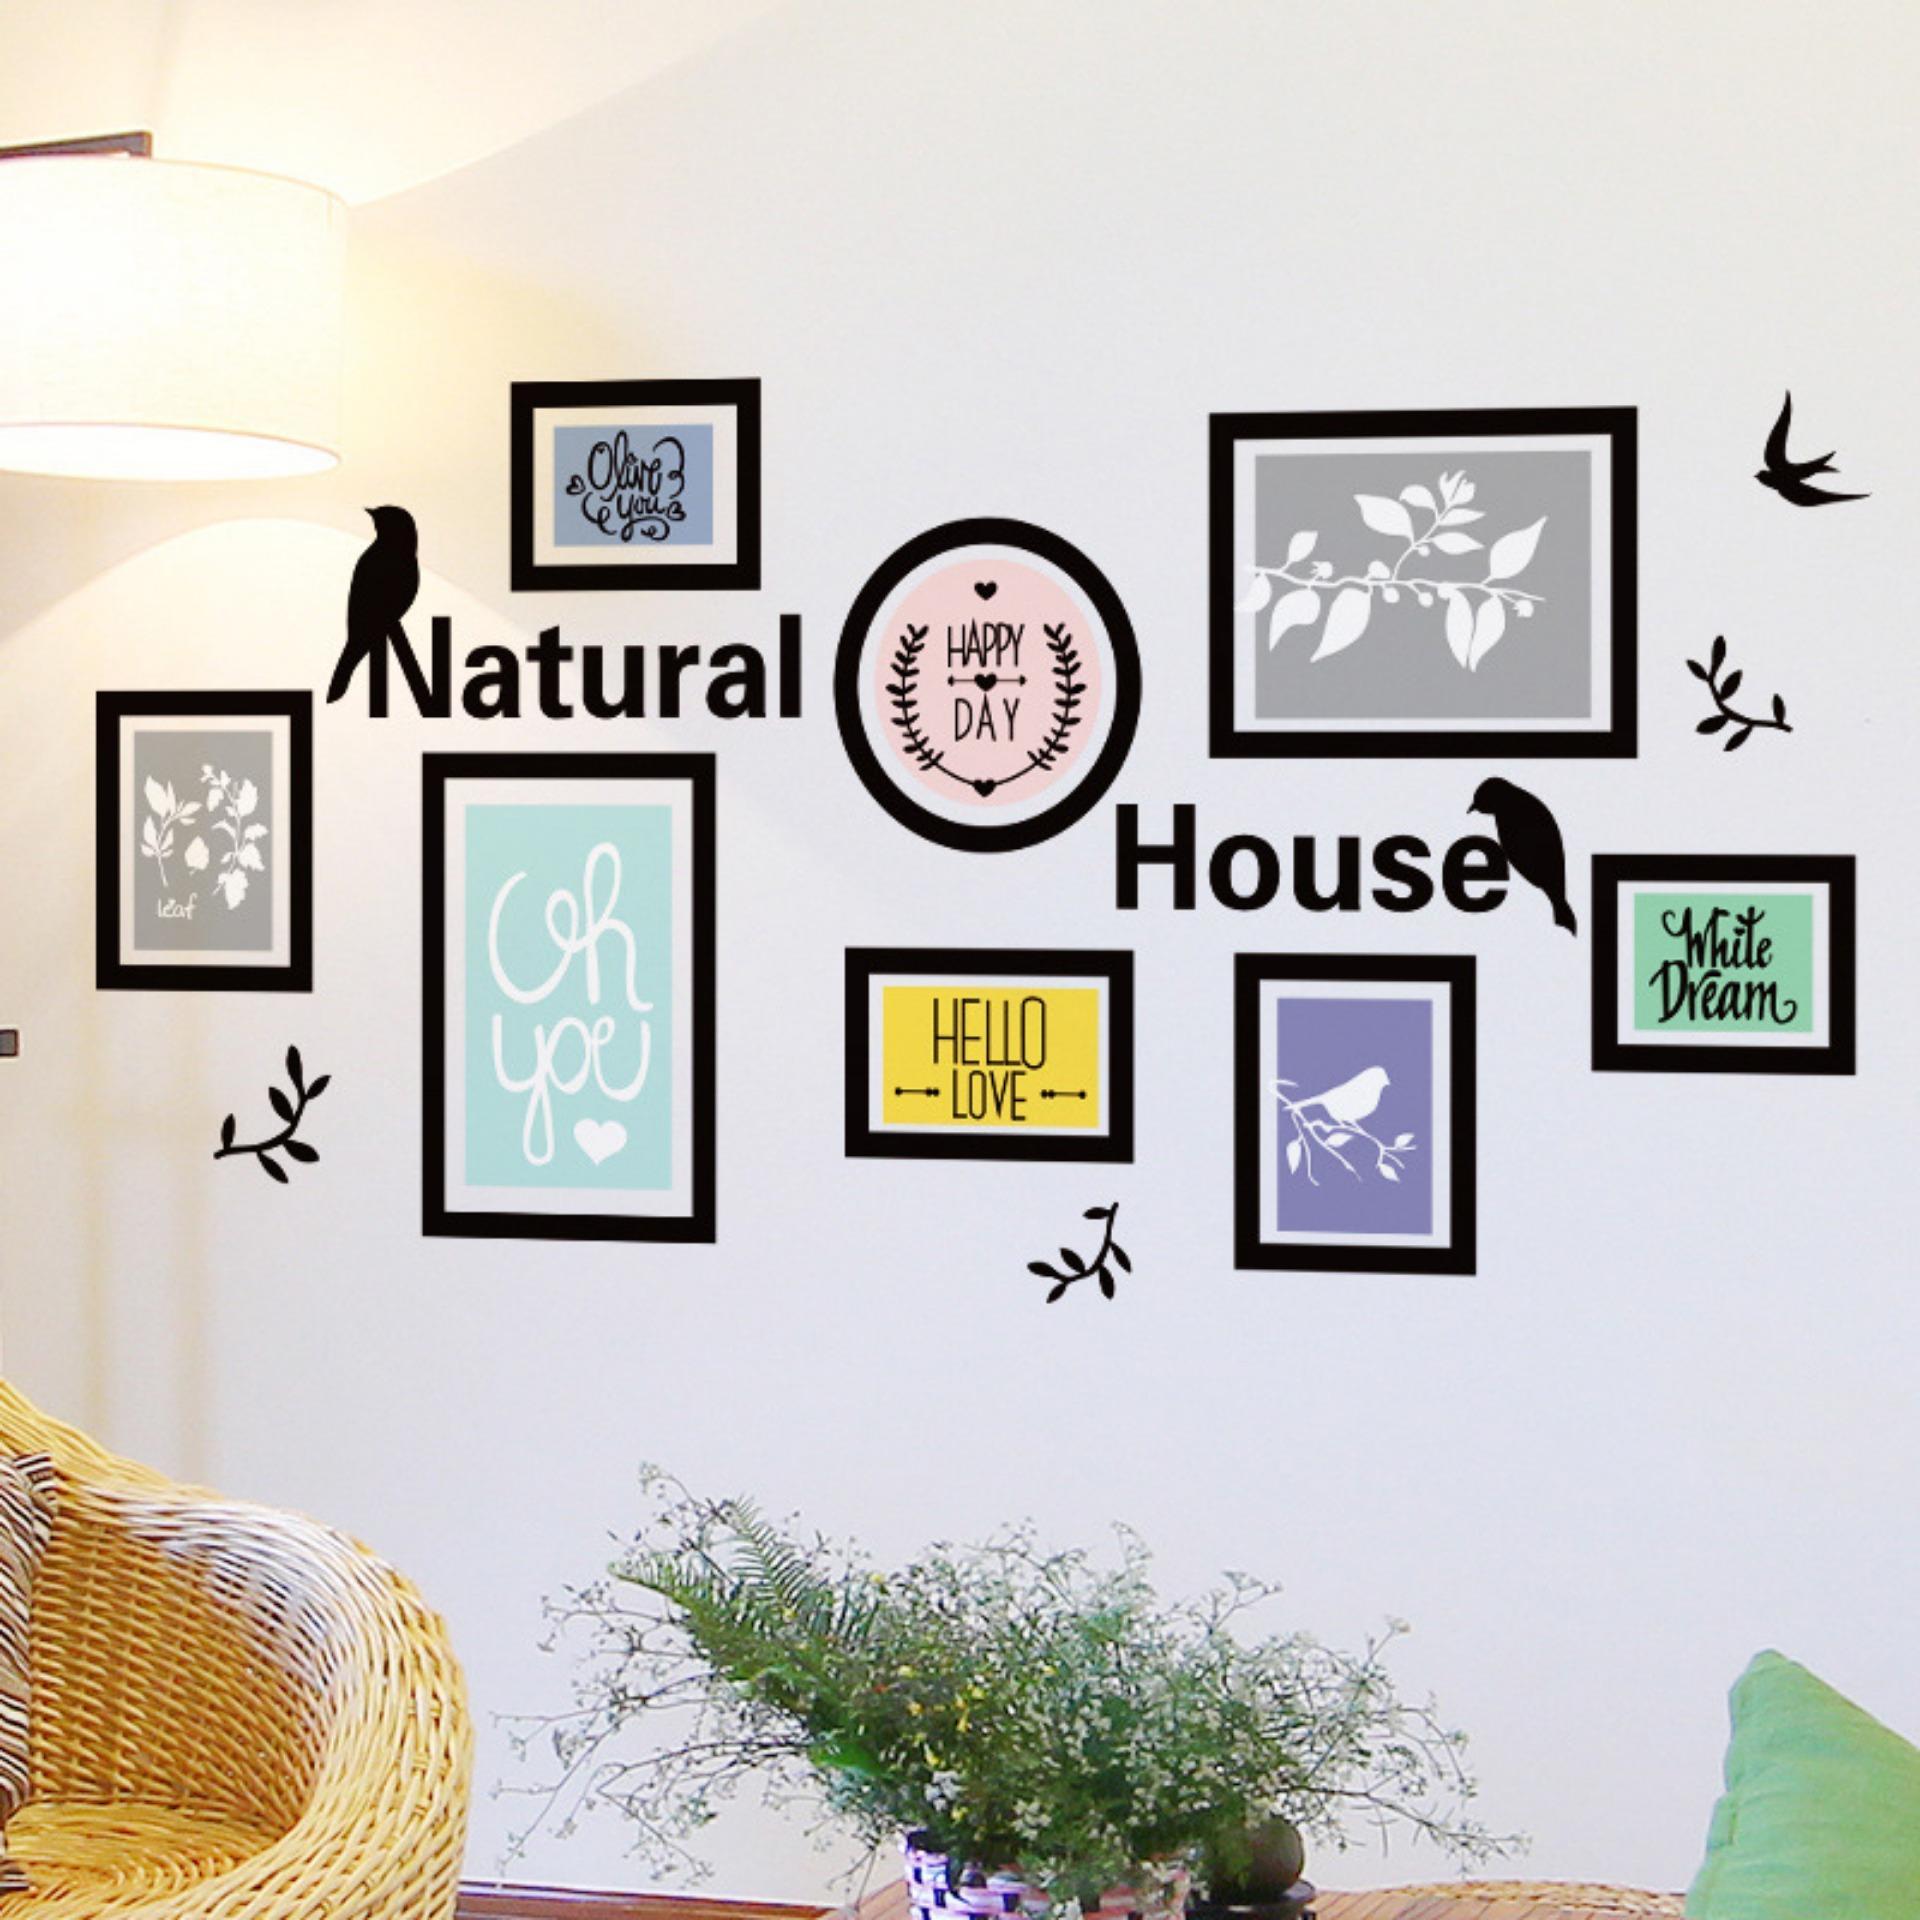 Mimosifolia Hiasan Dinding Latar Bingkai Ruang Tamu Dapur Wallpaper Stiker R Tidur Anak